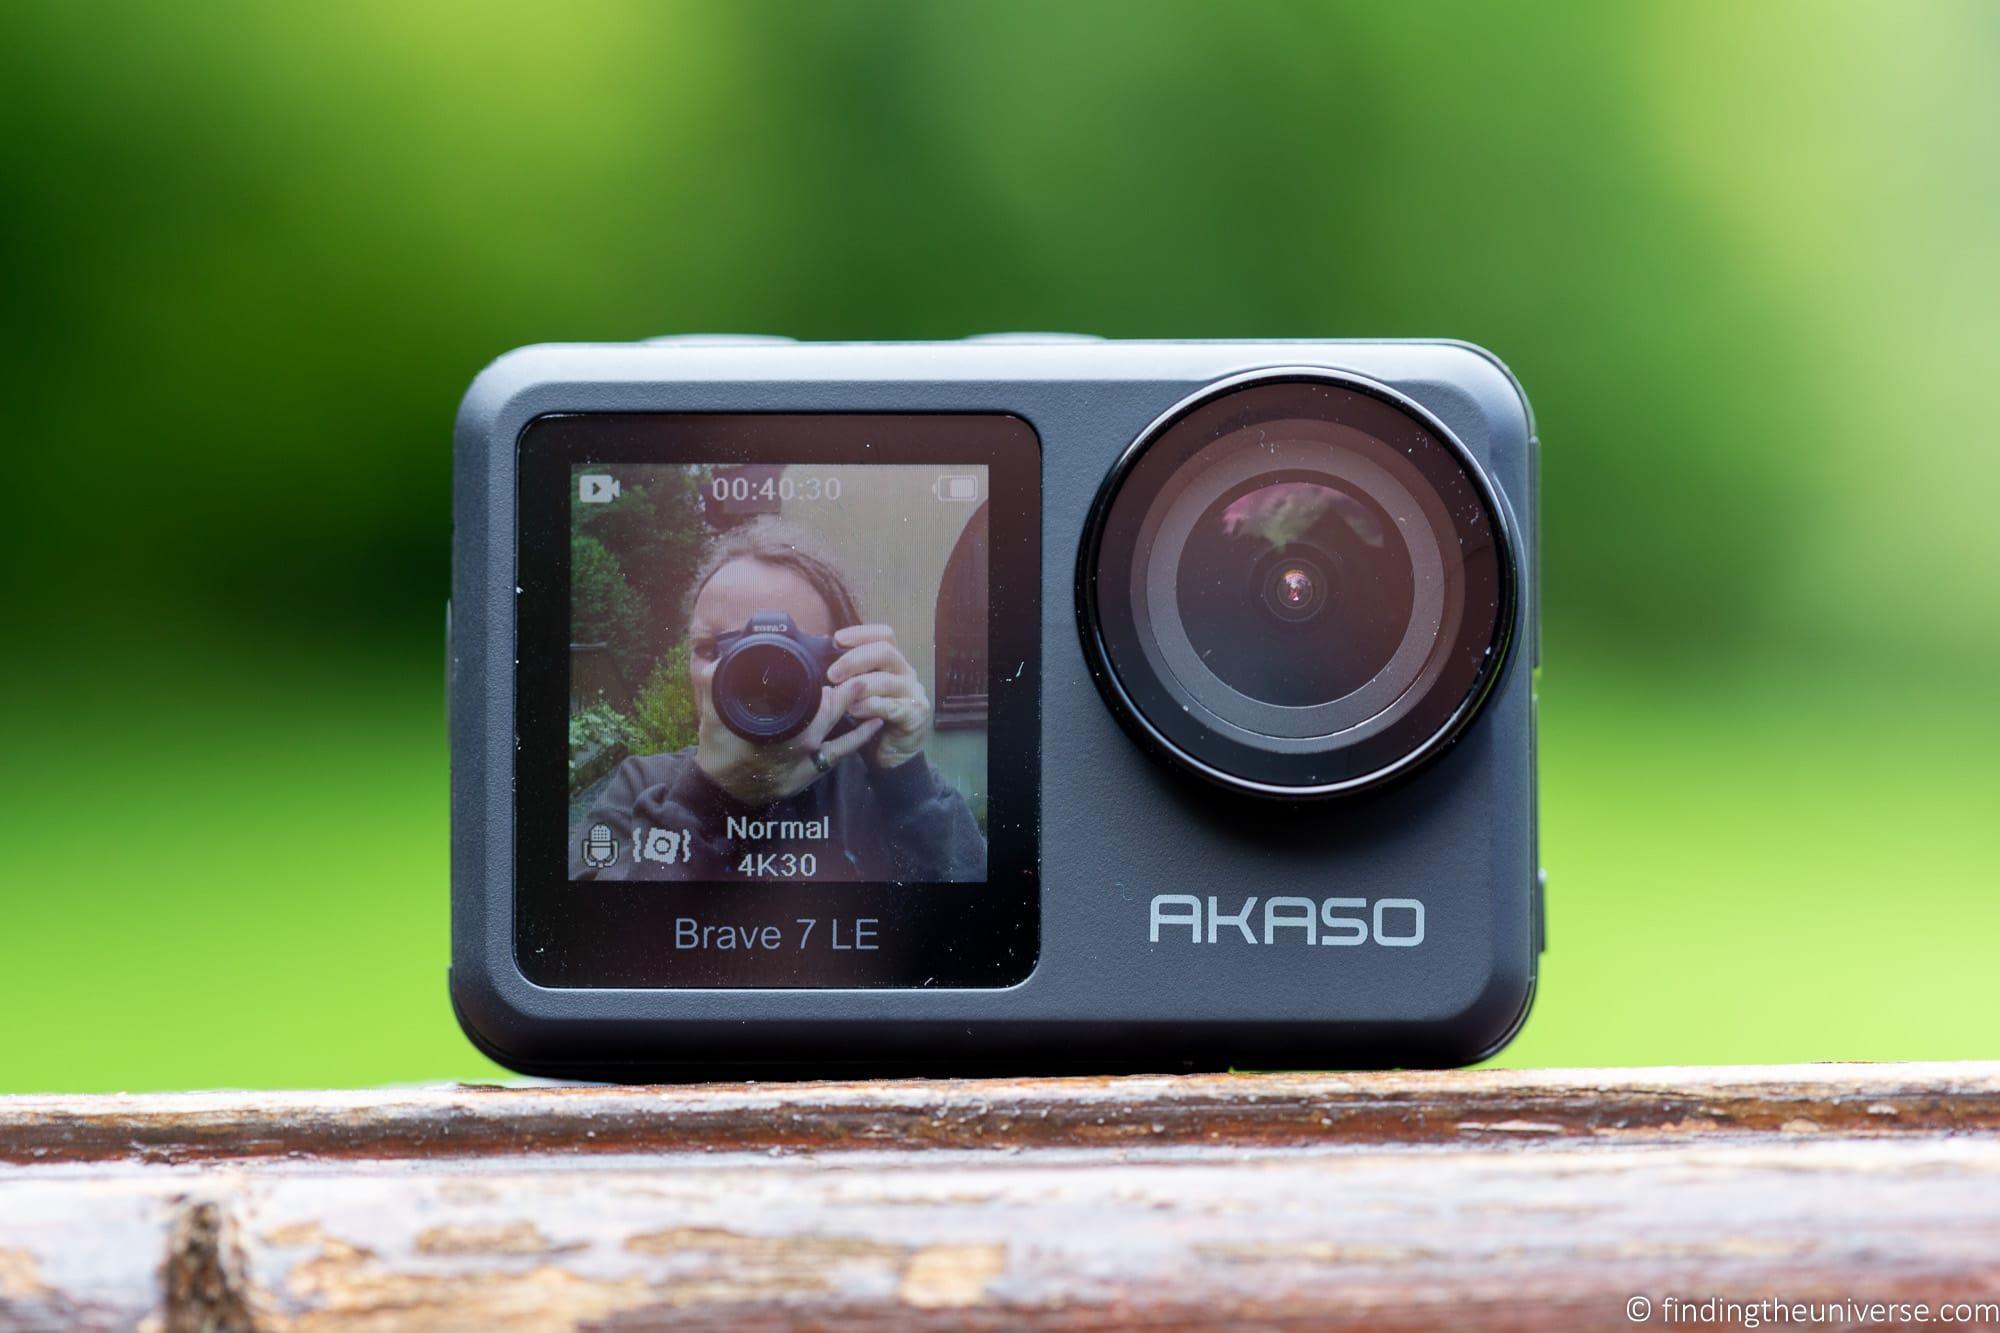 Akaso Brave 7 LE Action camera